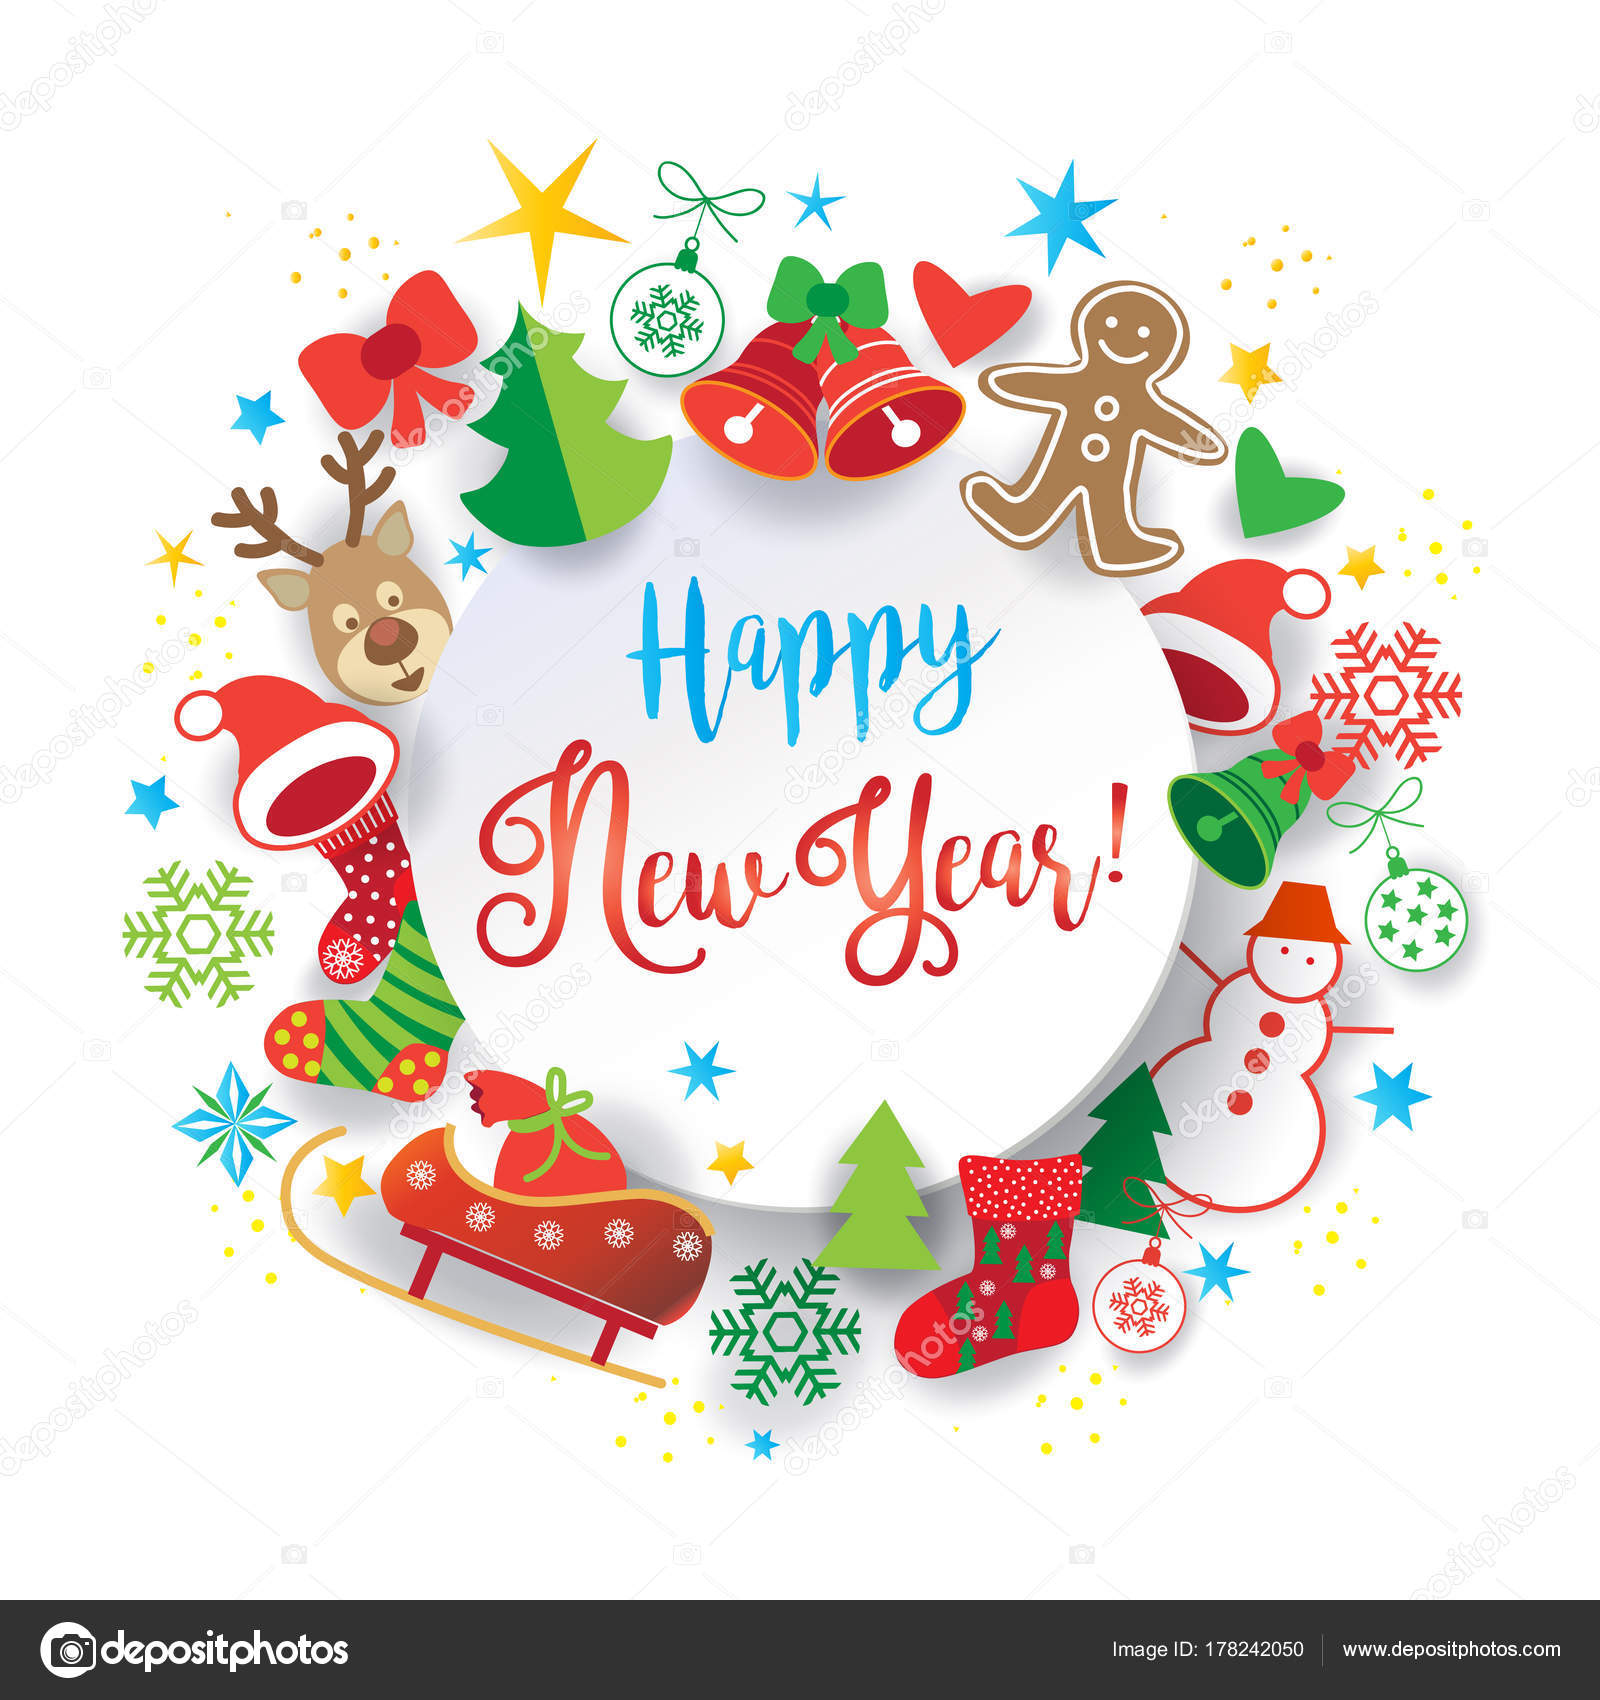 Christmas Winter Holiday Symbols Icons Greeting Card Happy New Year